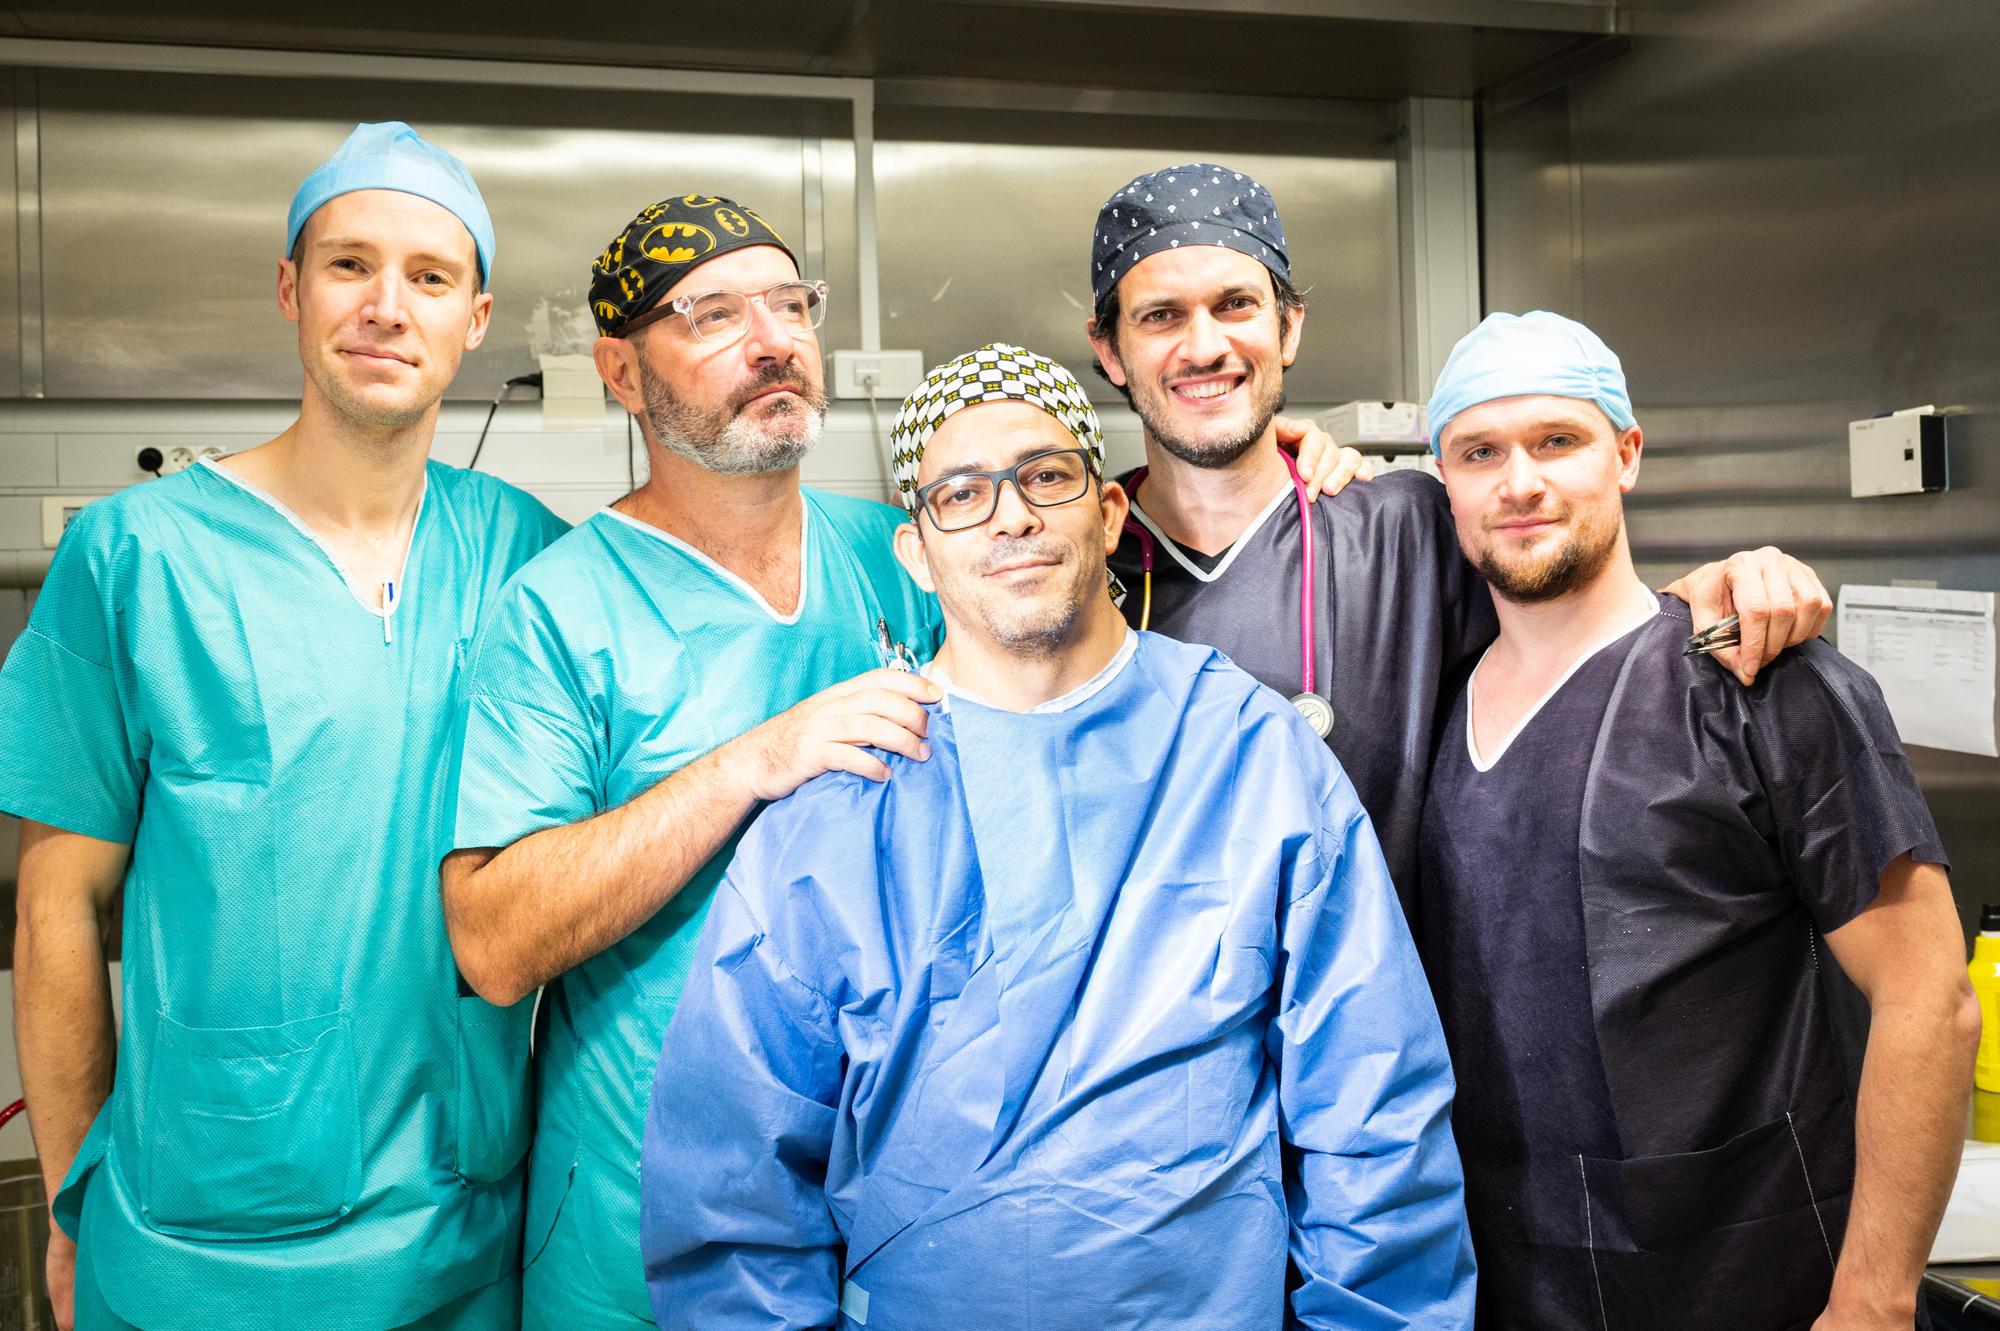 photo de Equipe des anesthésistes